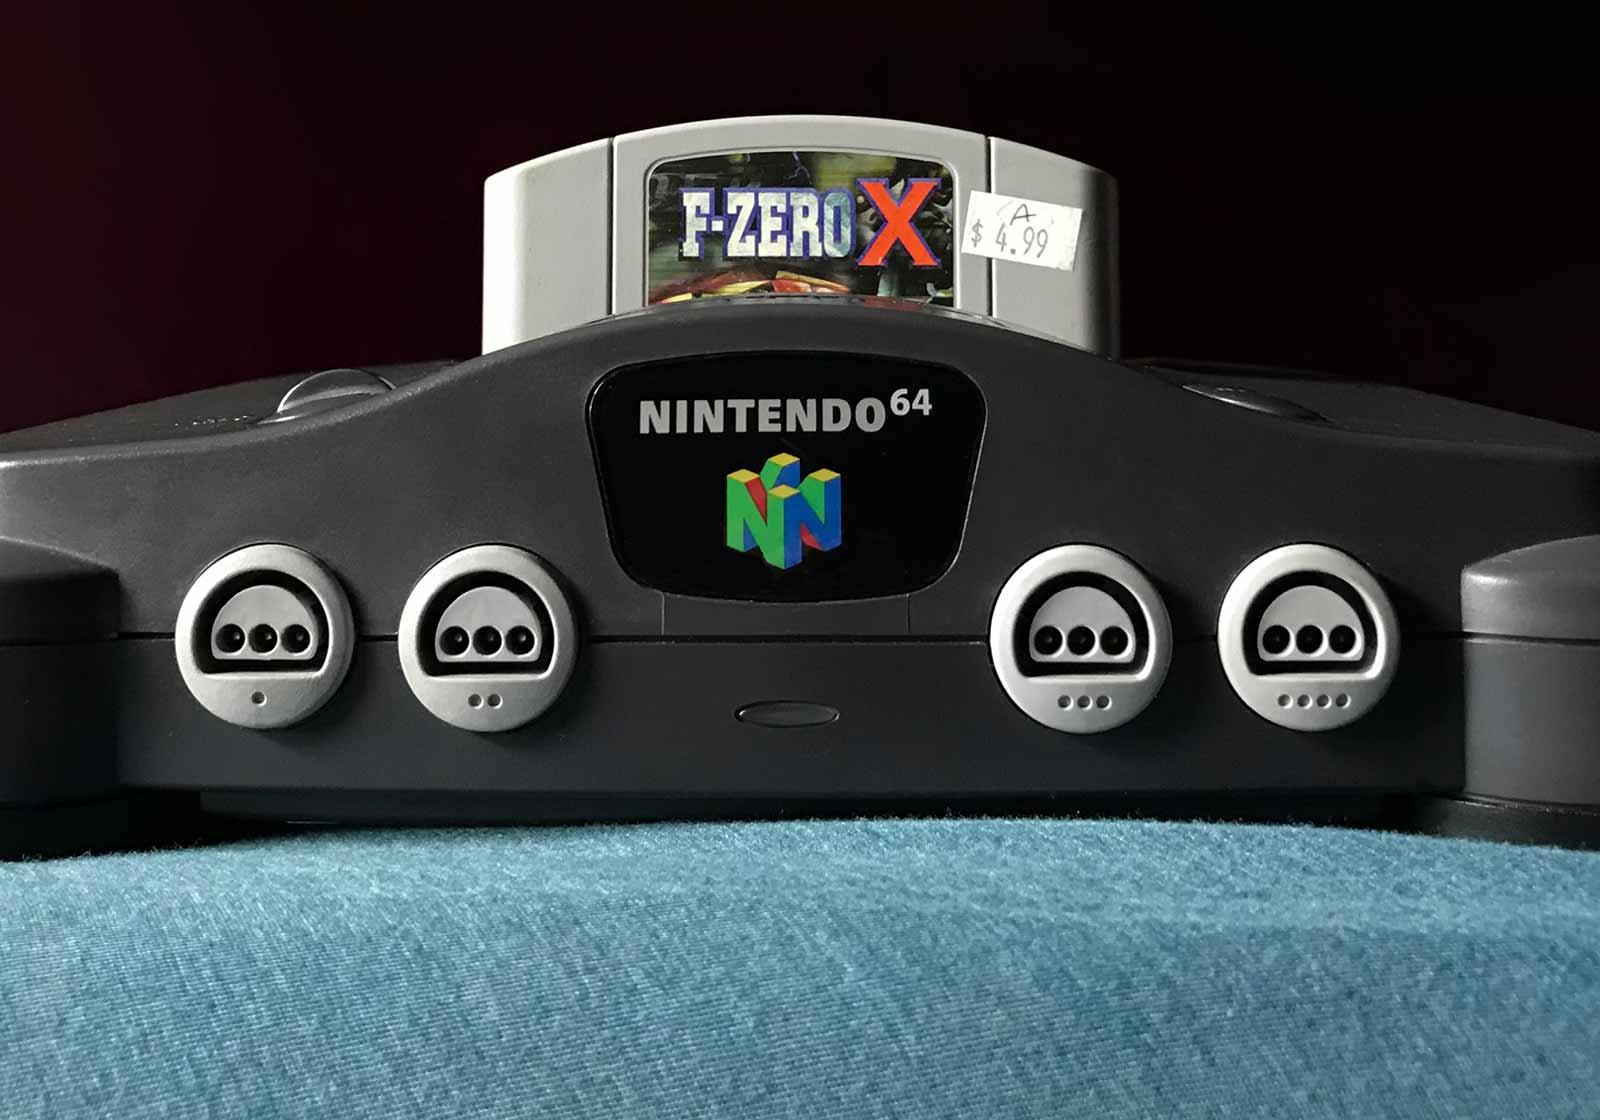 The Best Nintendo 64 (N64) Games Under $15 - RetroGaming